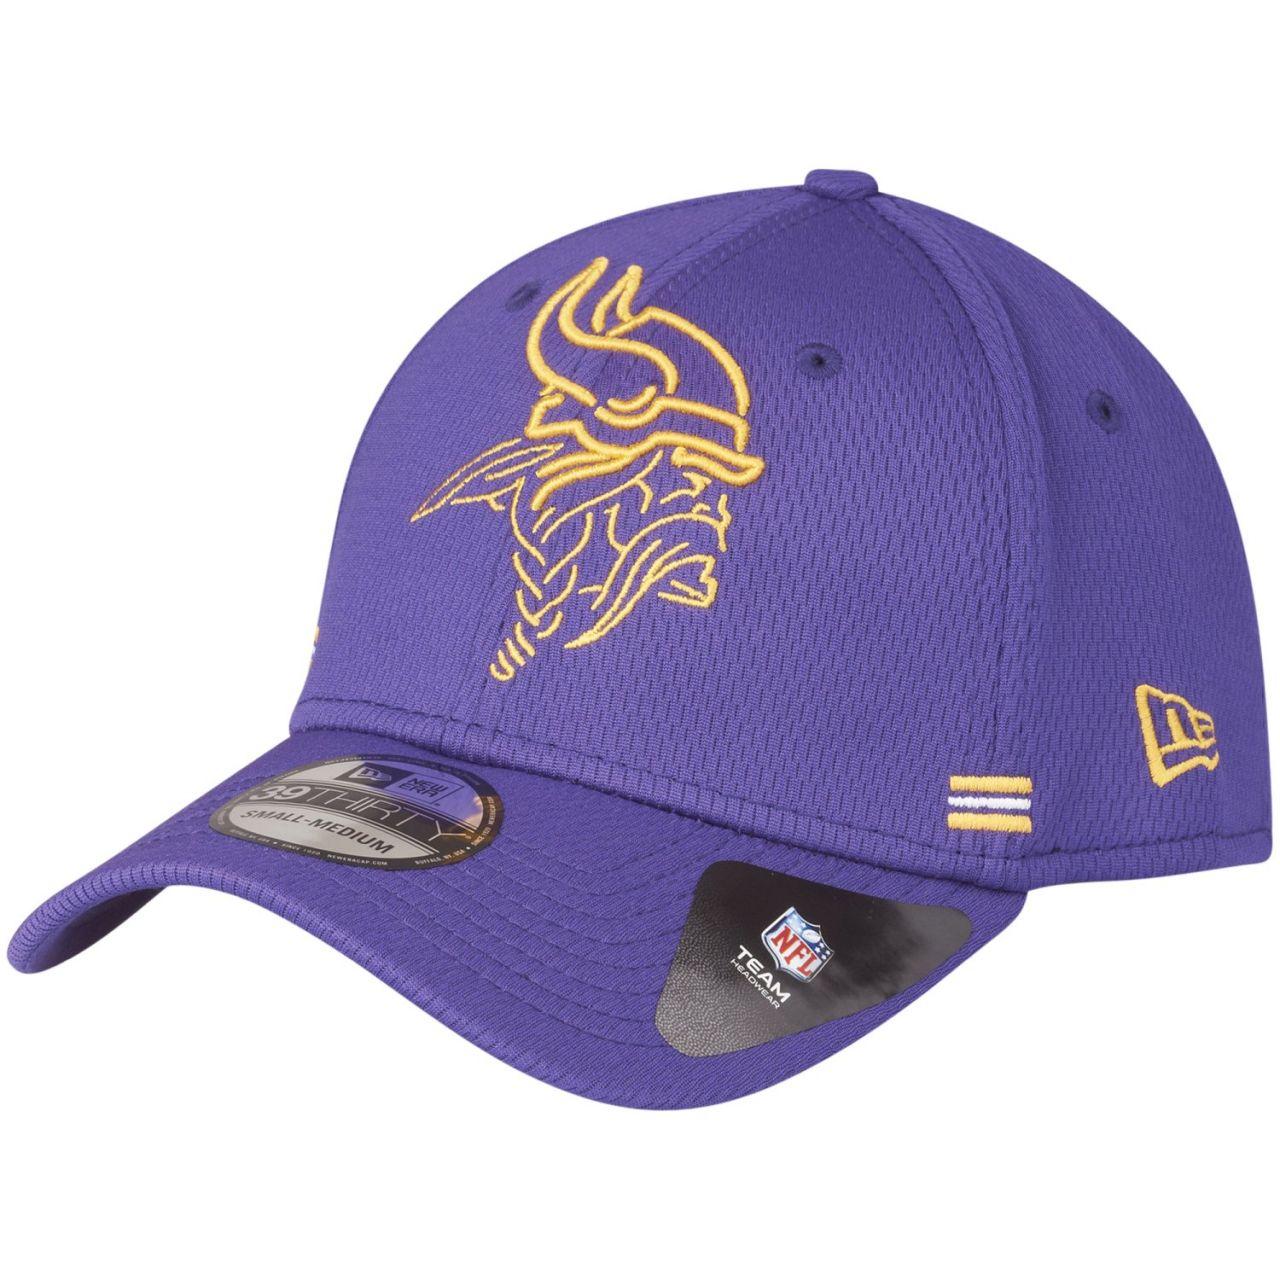 amfoo - New Era 39Thirty Cap - HOMETOWN Minnesota Vikings